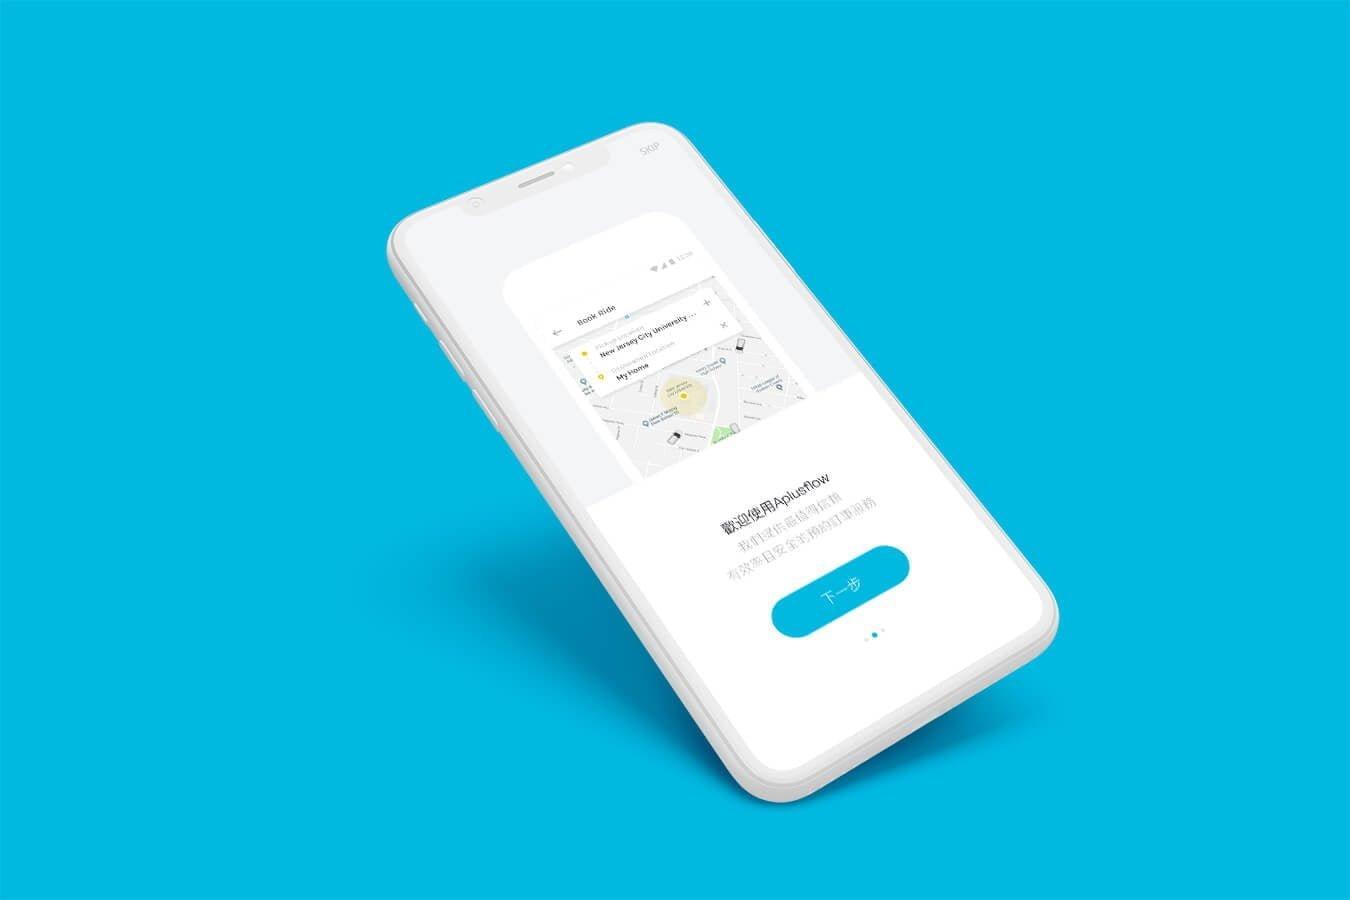 UIUX   介面設計   掌握最新顯示裝置設備動態,打造兼具最佳使用者體驗及最具品牌特色的介面設計!